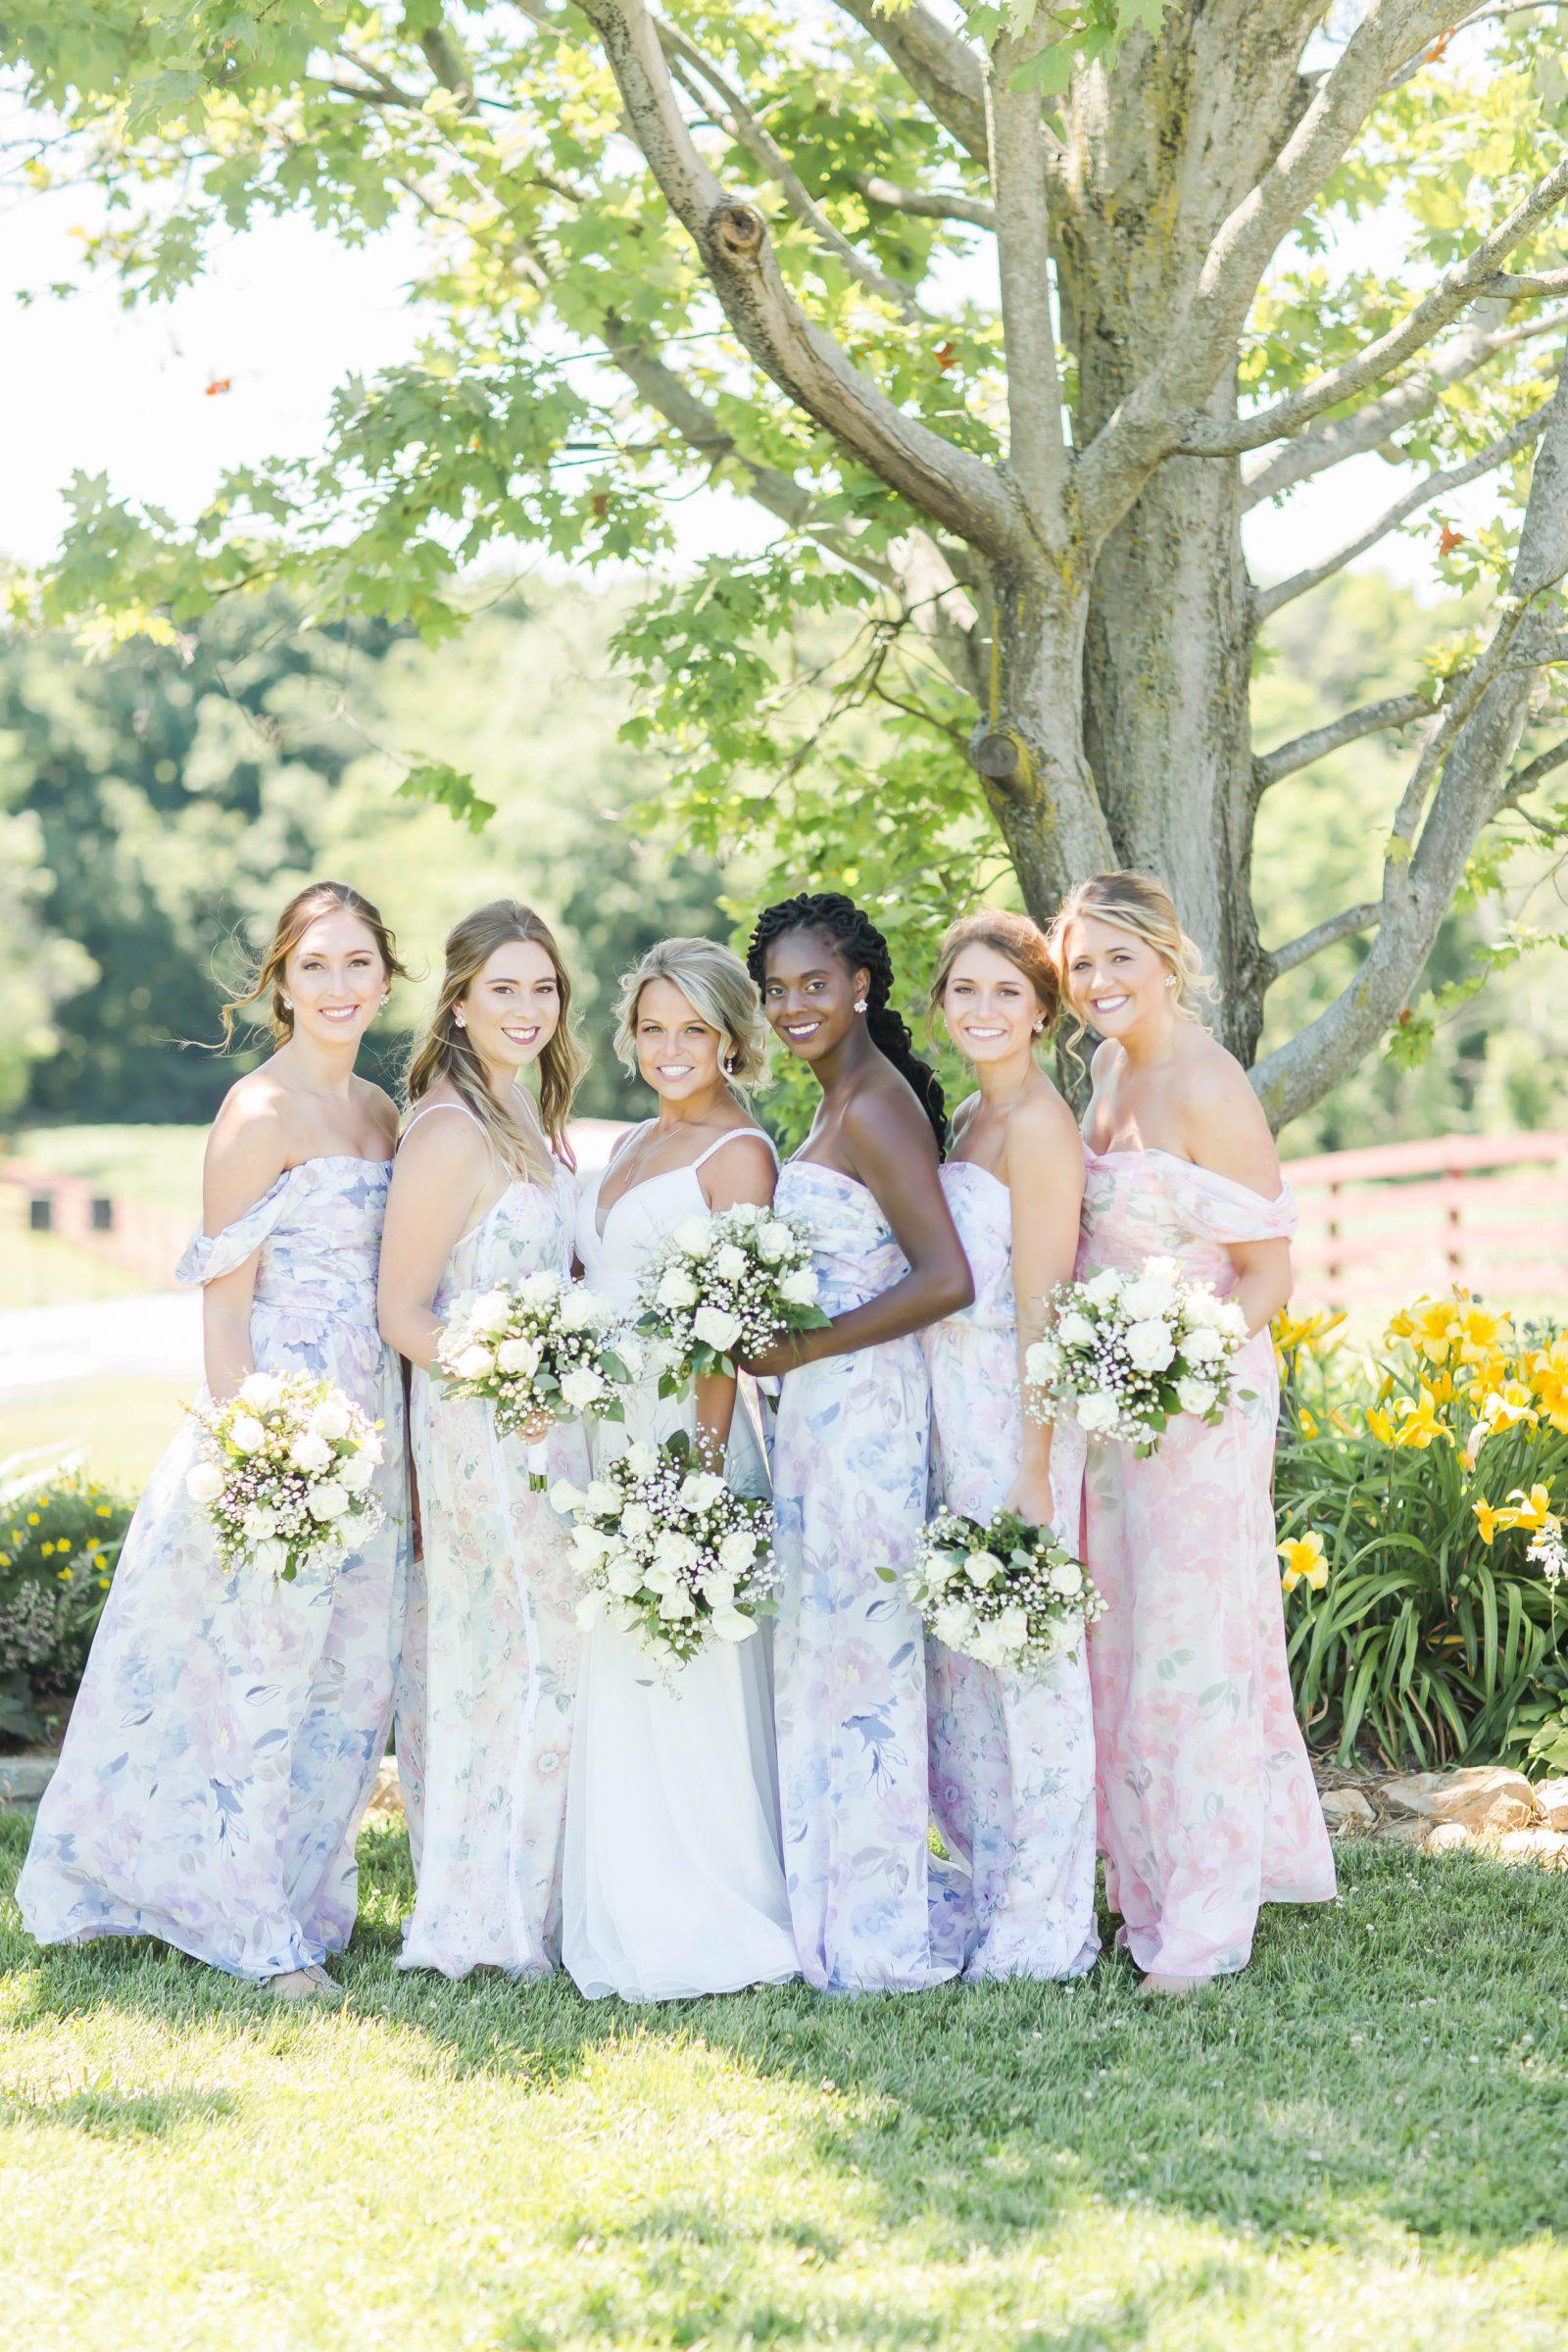 peacock-ridge-summer-wedding-photographer-akron-ohio-loren-jackson-photography-62